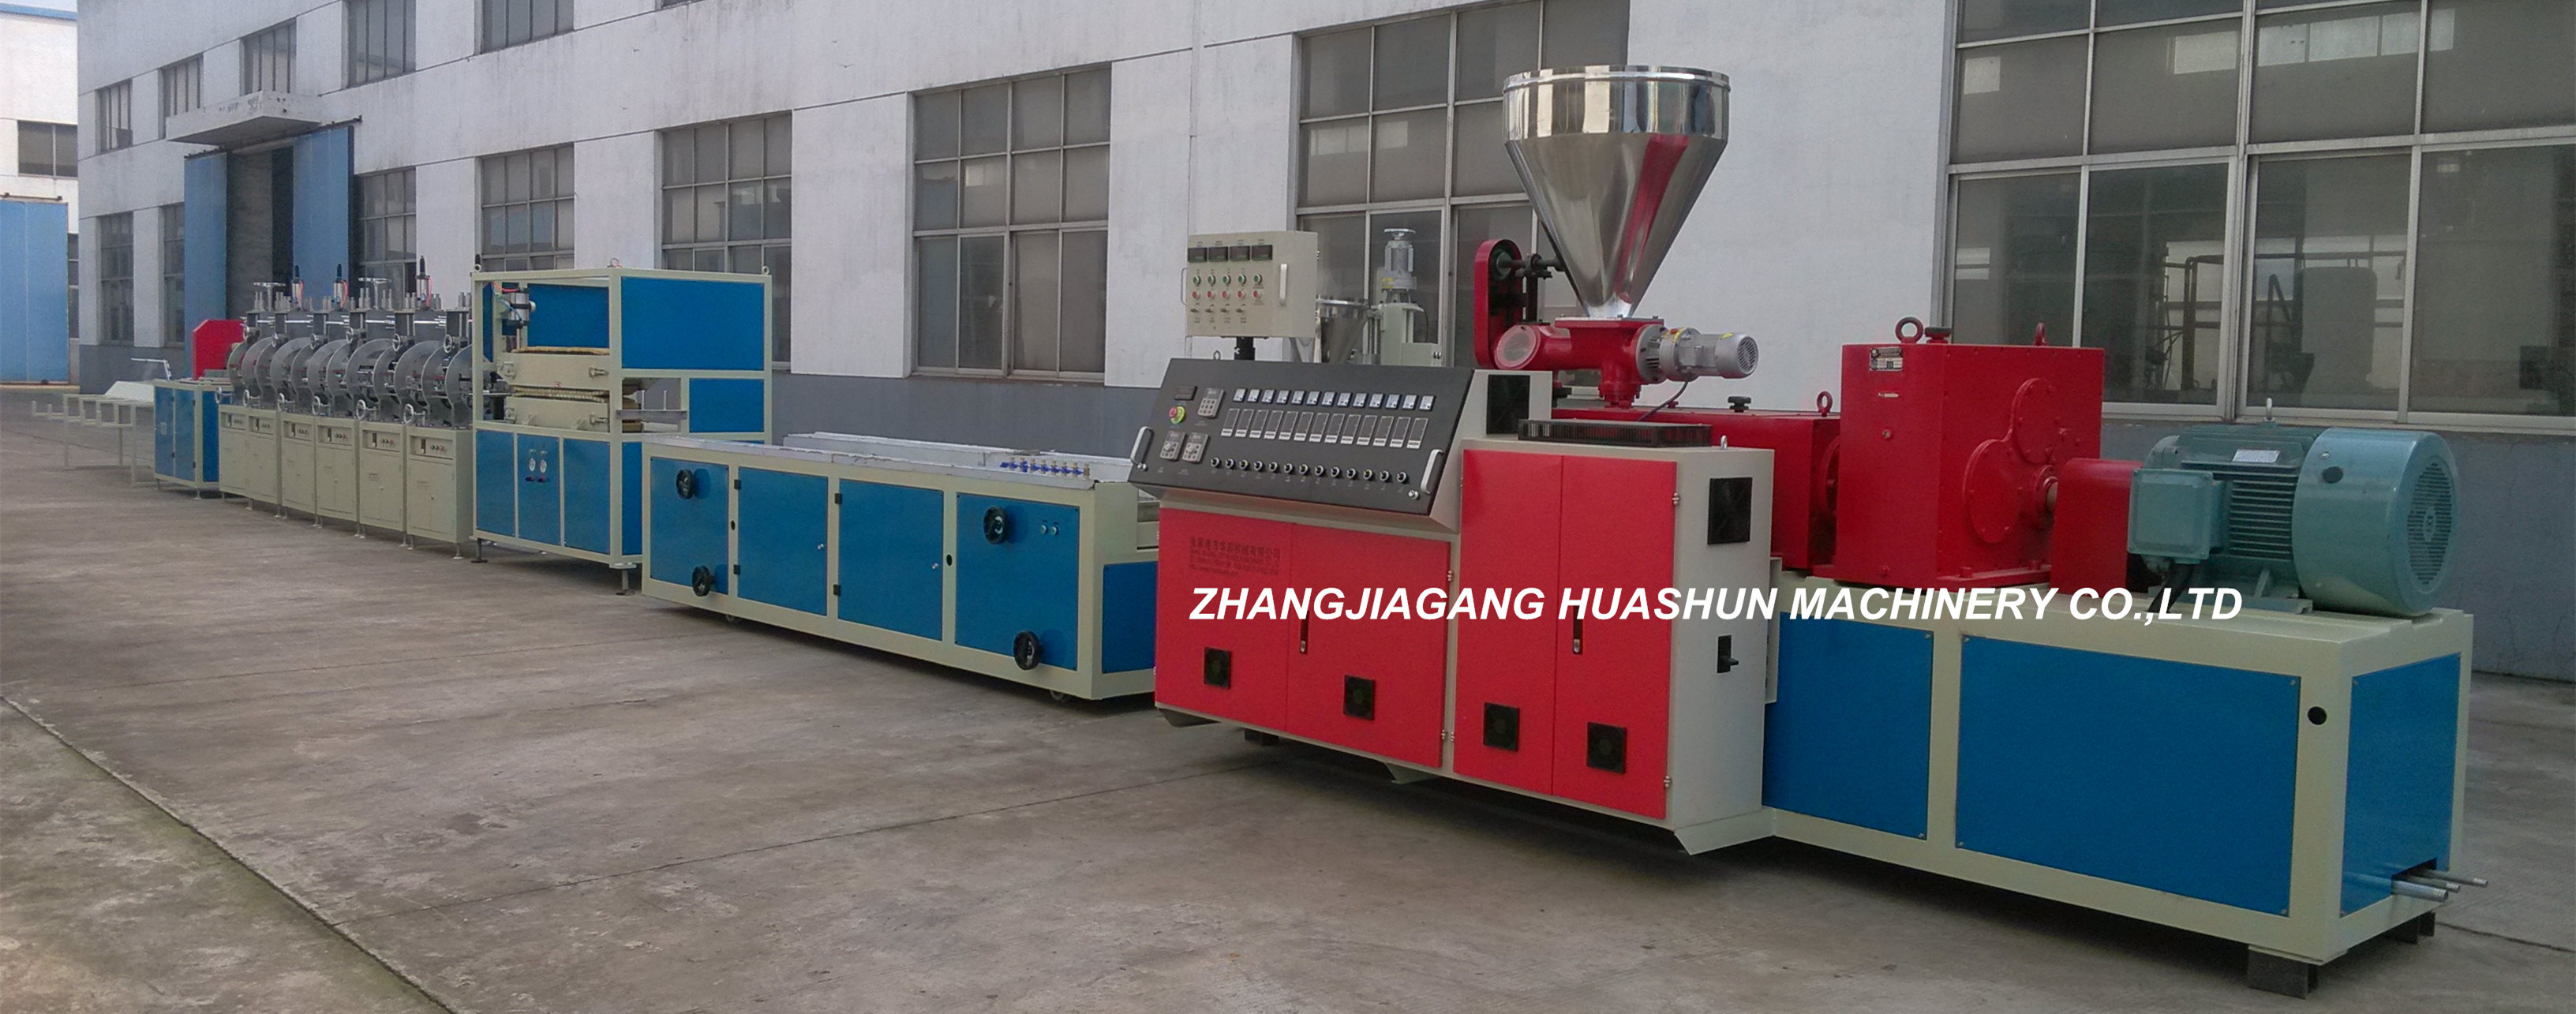 Artificial Ceramic Tile Making Machine Extrusion Line China